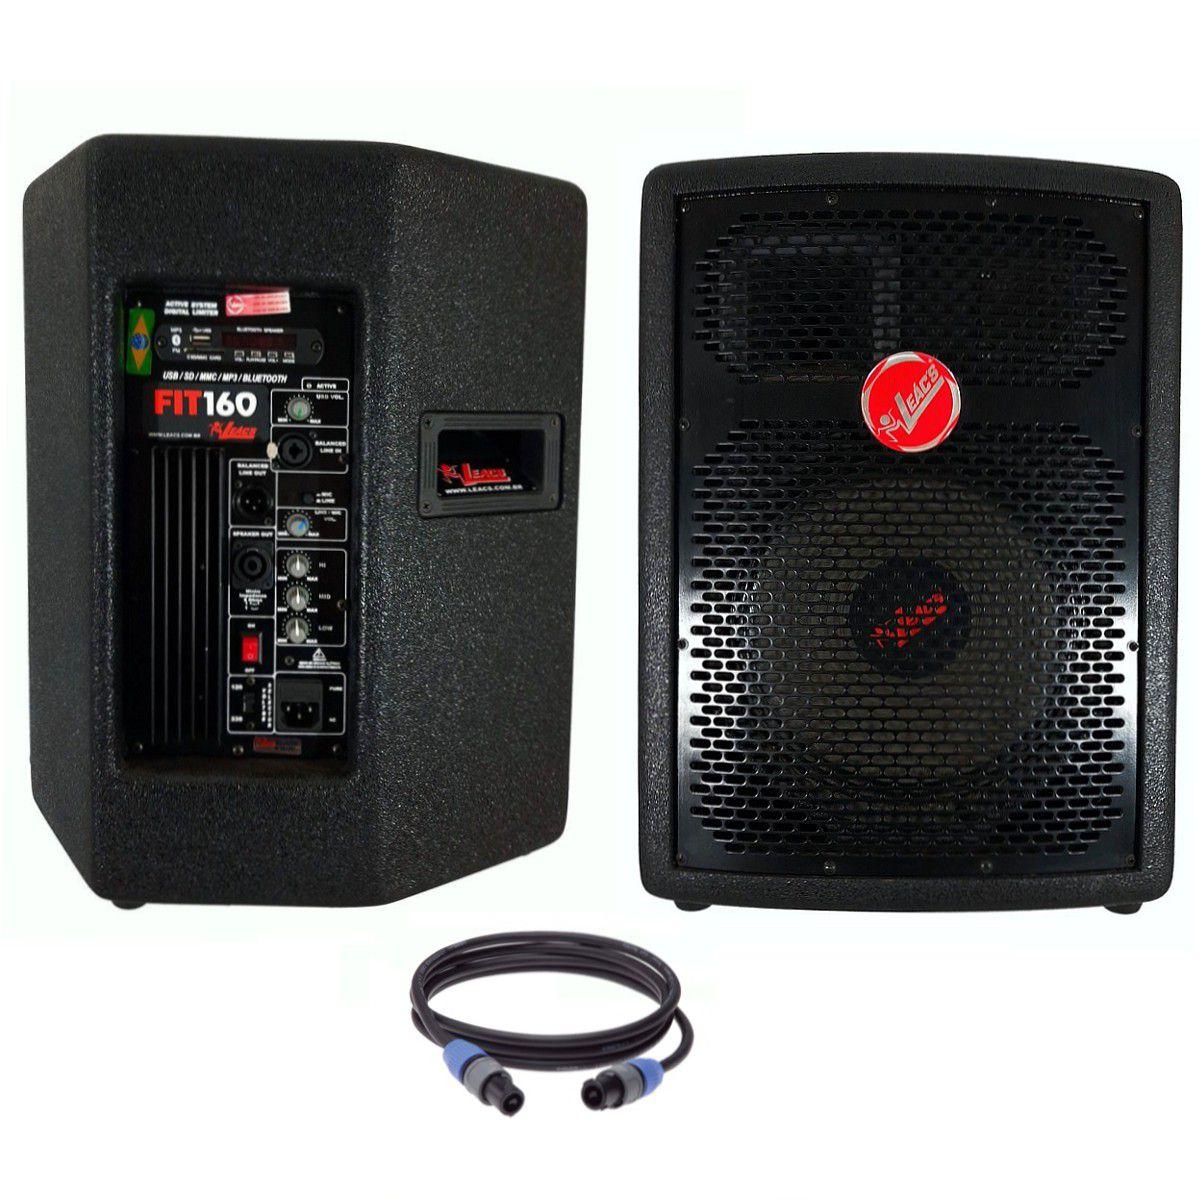 Kit Caixa de Som Ativa Passiva Leacs Fit160a Fit160 230w Rms Falante 10